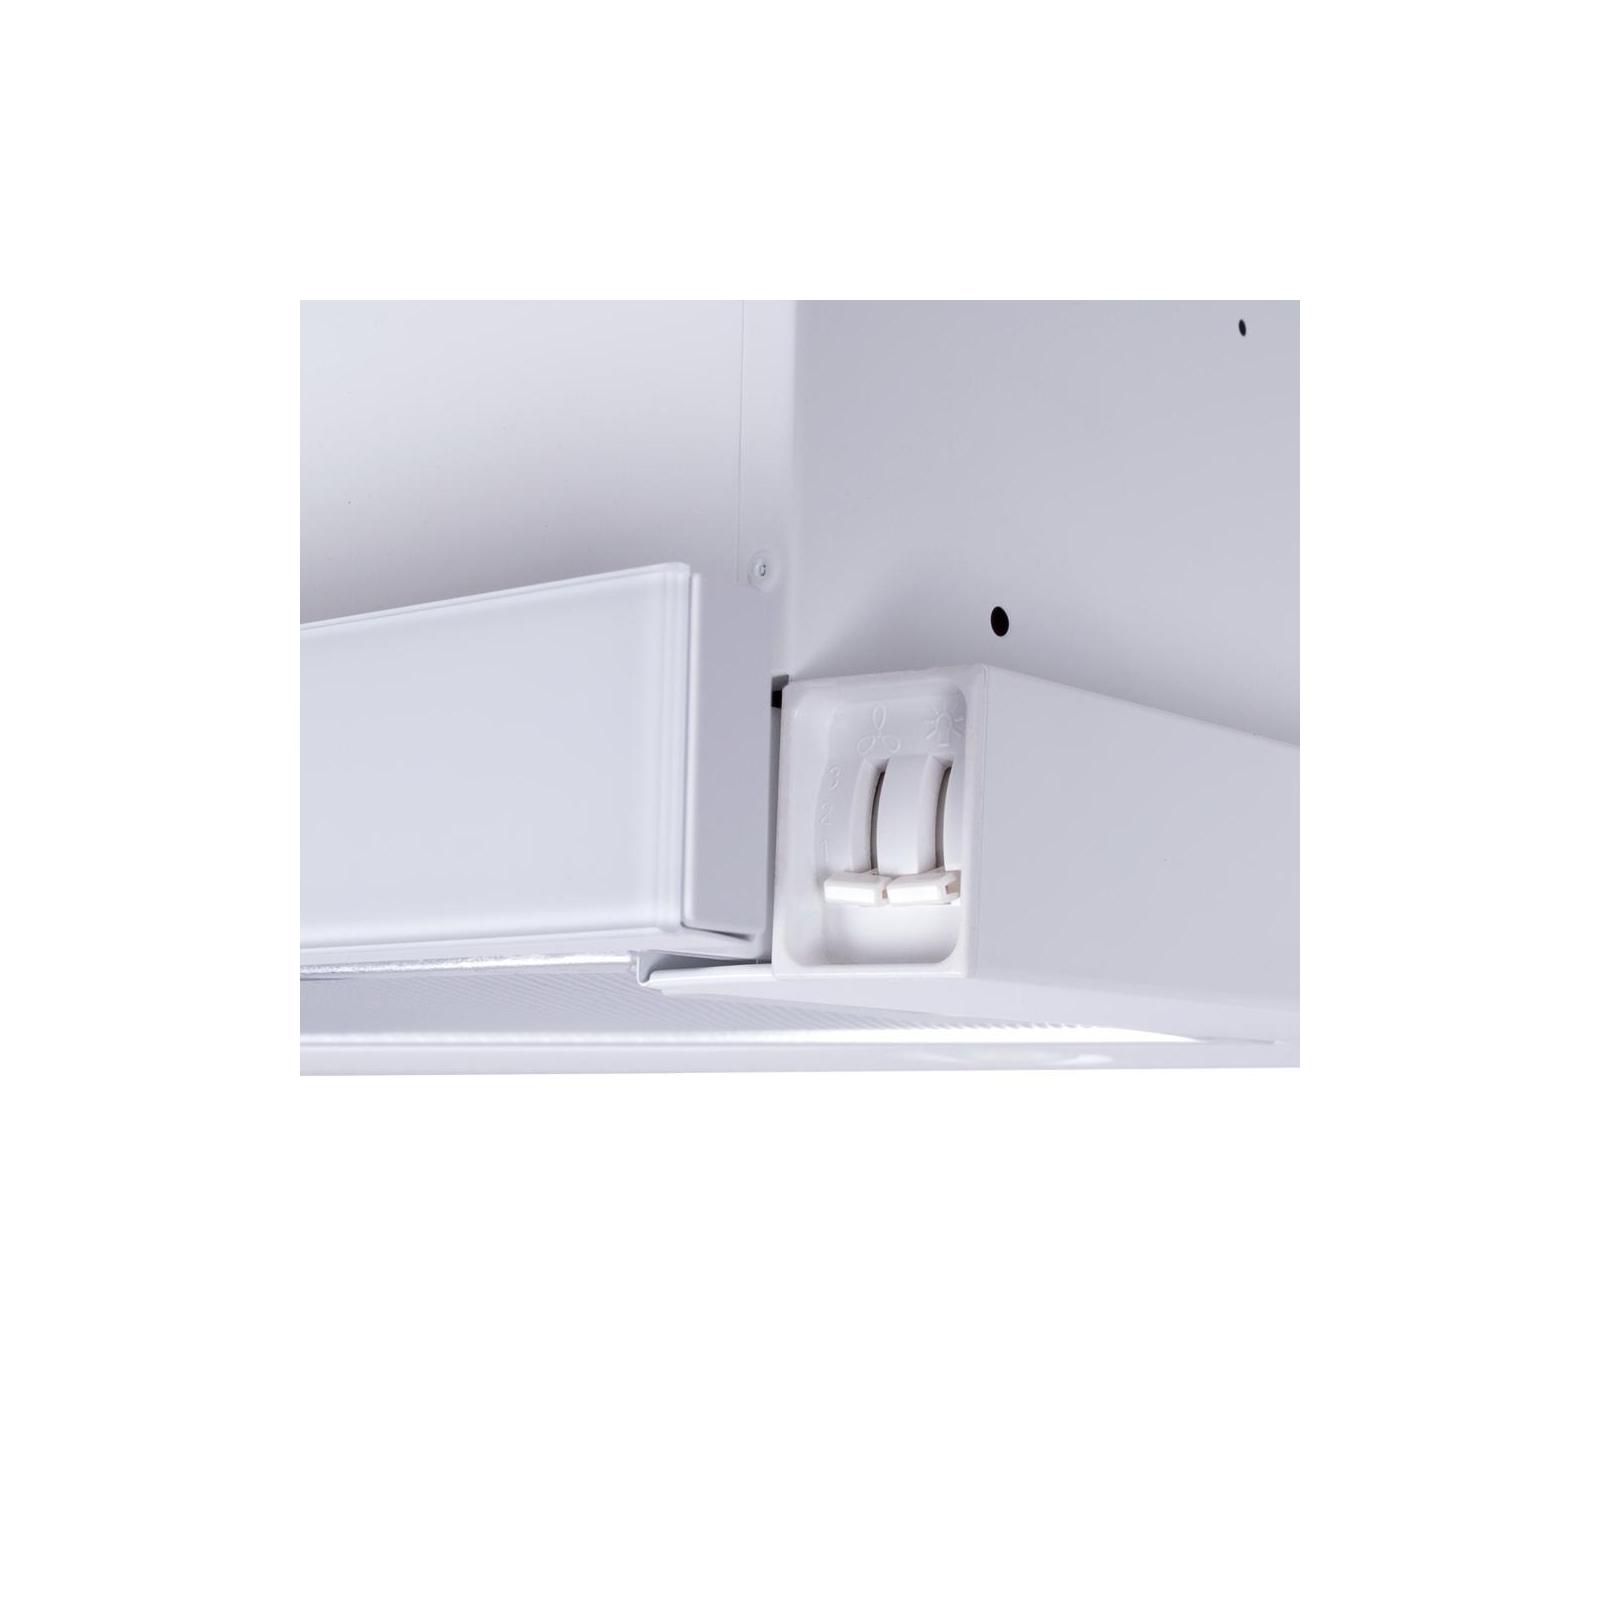 Вытяжка кухонная PERFELLI TL 6632 A 1000 W GLASS изображение 4